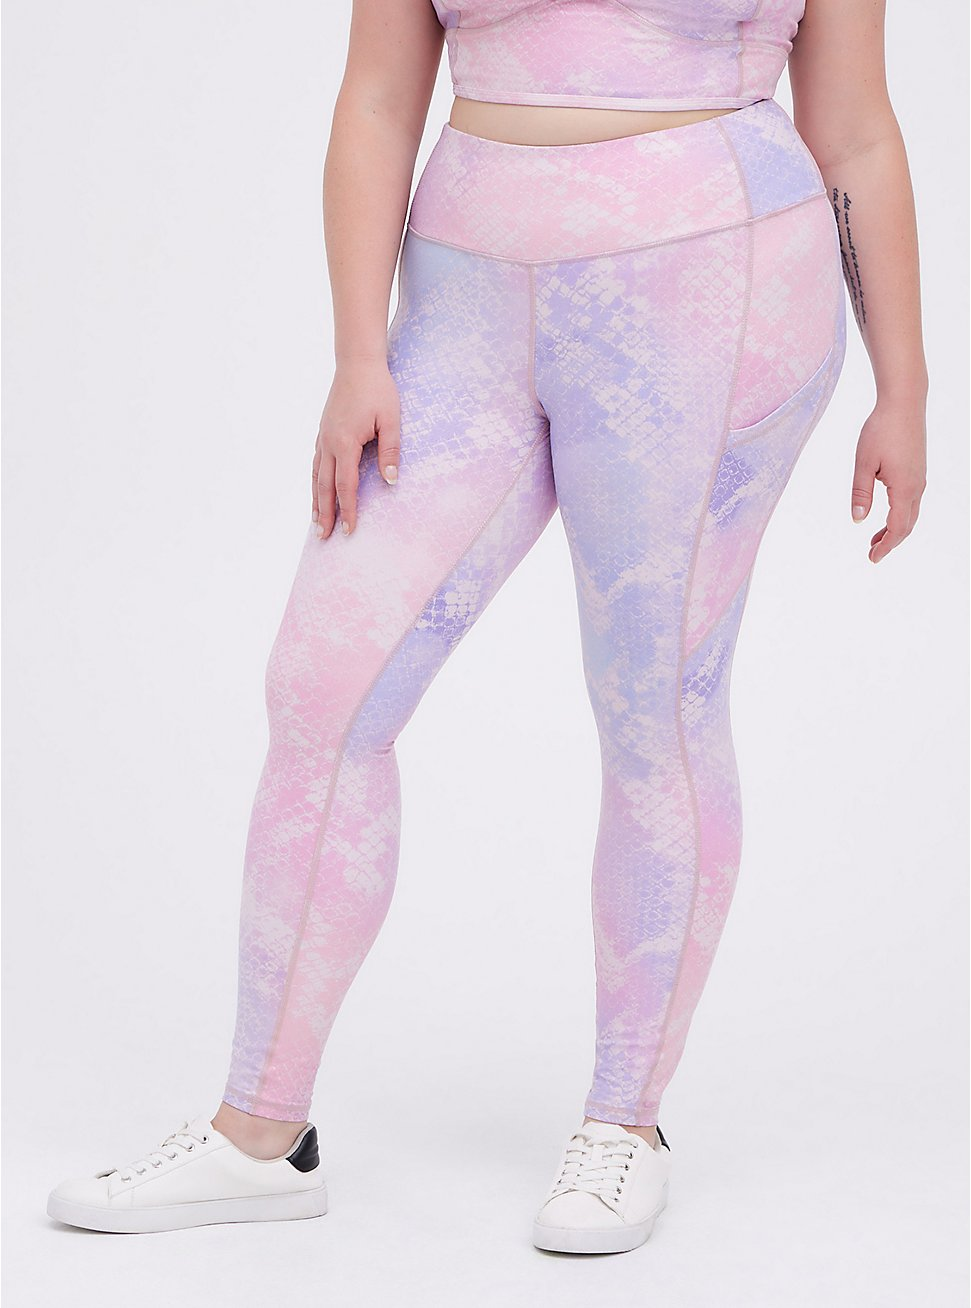 Plus Size Active Wicking Full Length Legging - Purple Shine, SNAKE - PINK, hi-res